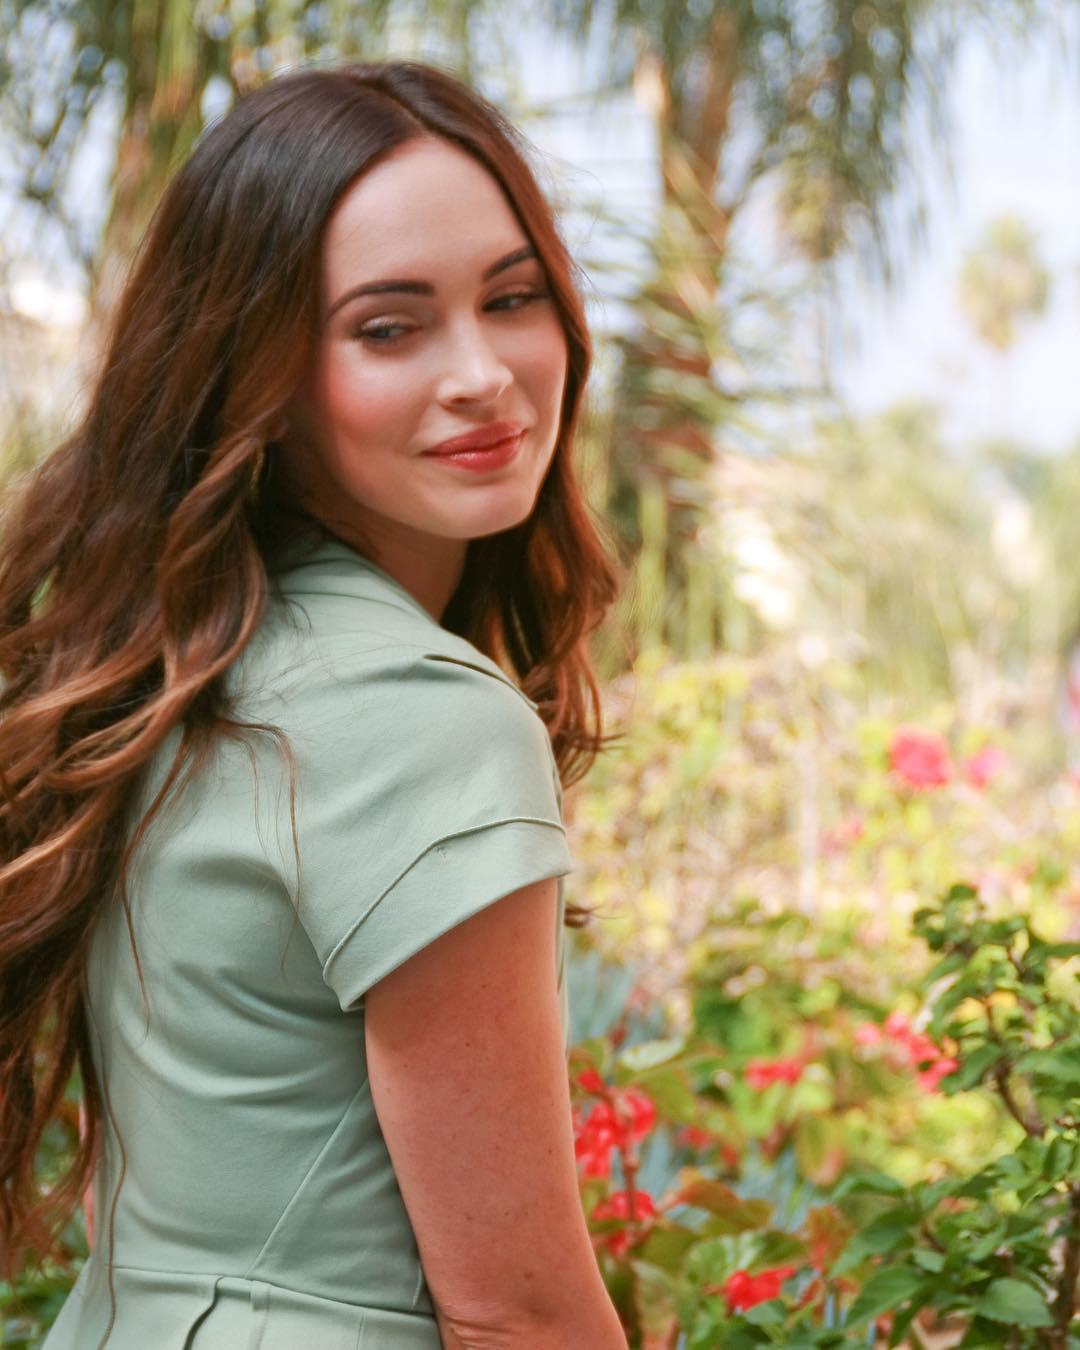 Megan-Fox-Wallpapers-Insta-Fit-Bio-10